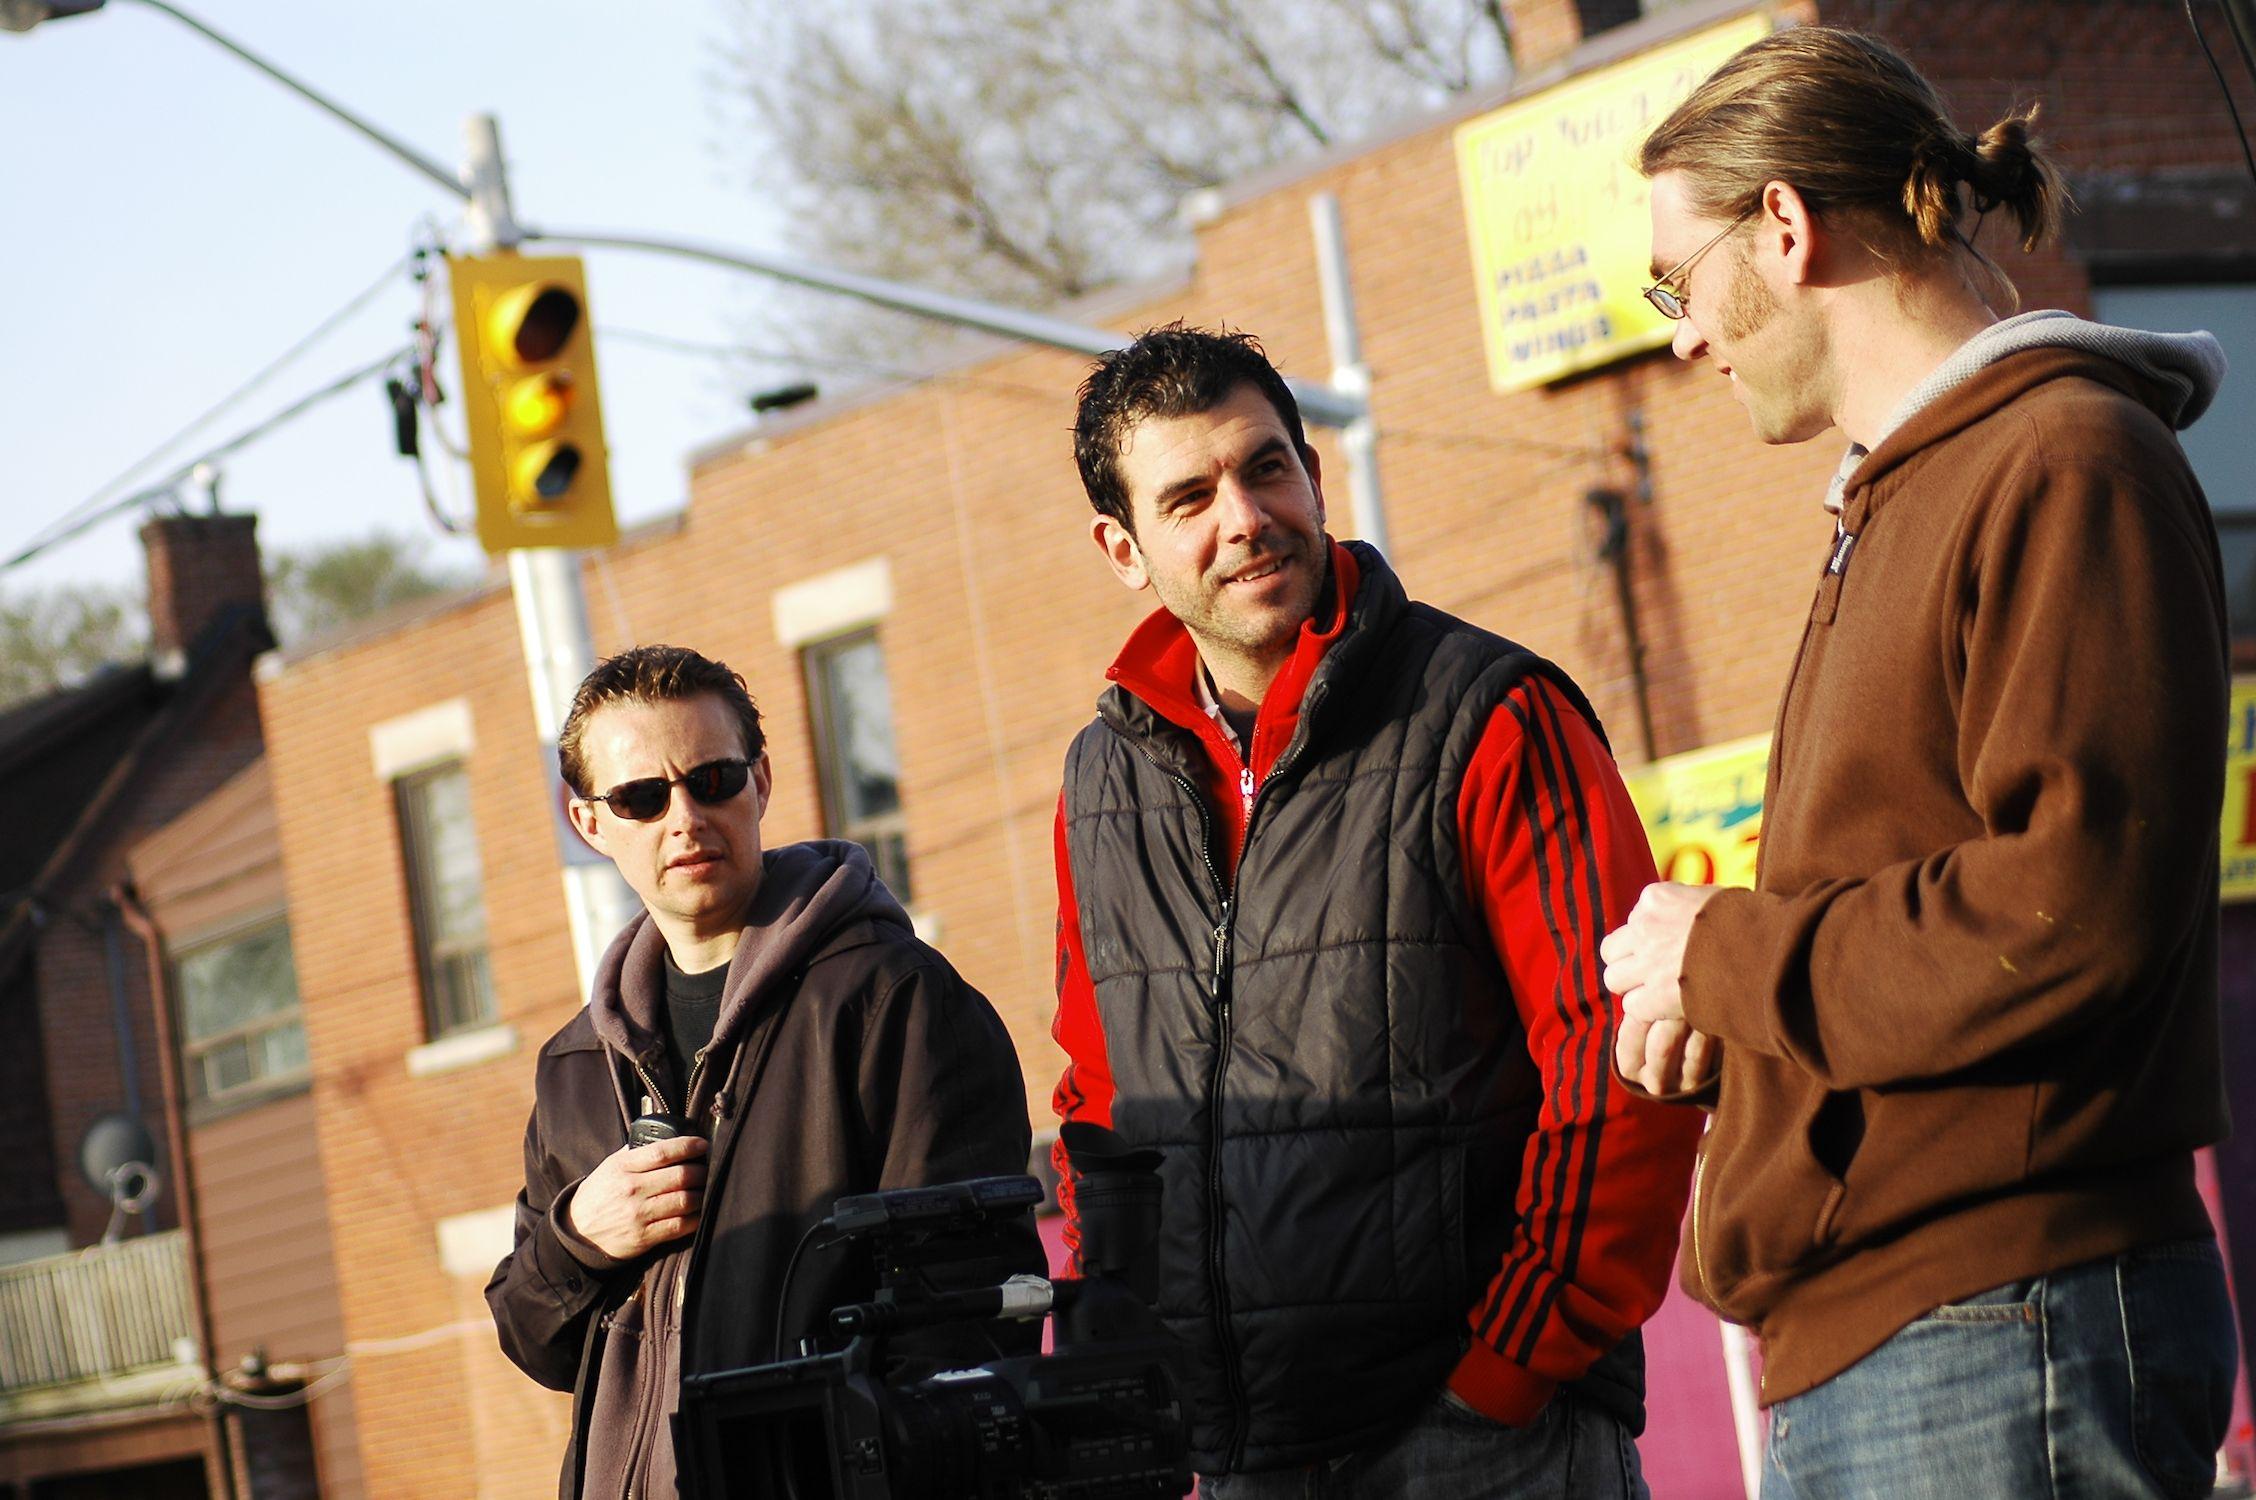 Alex Jordan, Alex Dacev & Ken Simpson setting up a shot